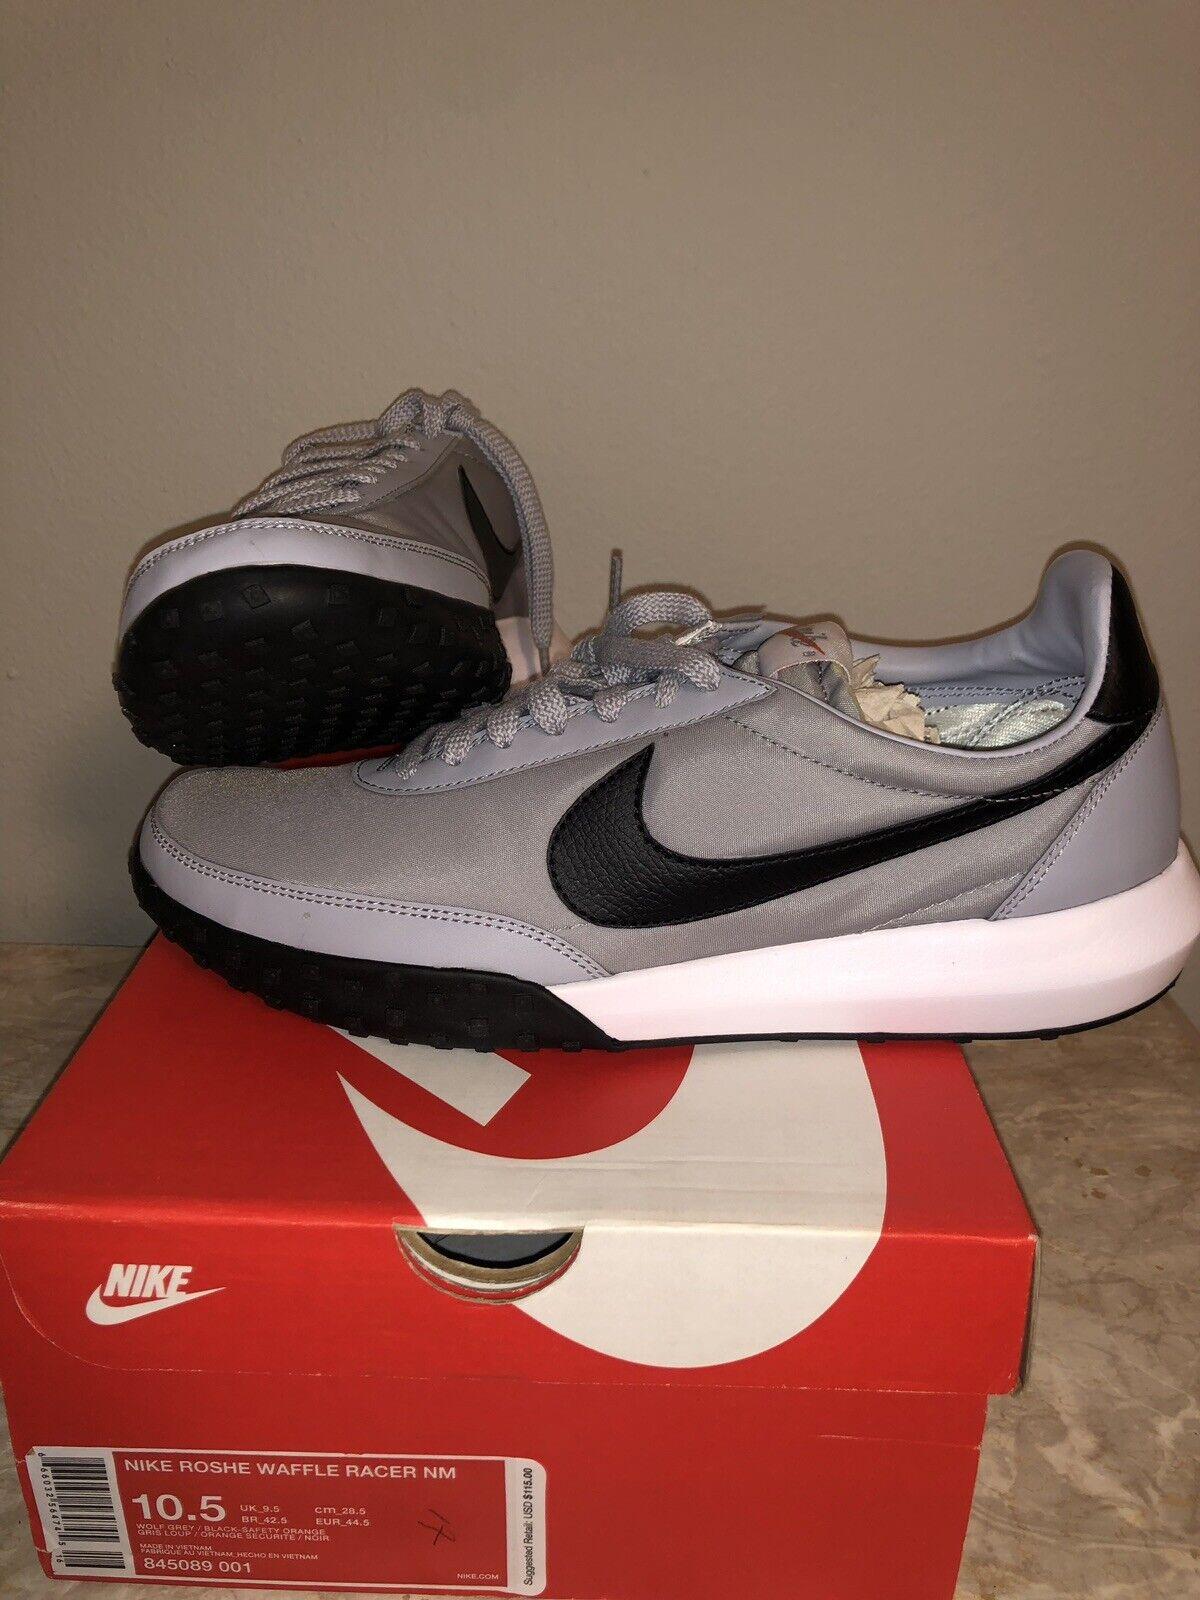 Nike Roshe Waffle Racer NM Mens Shoes